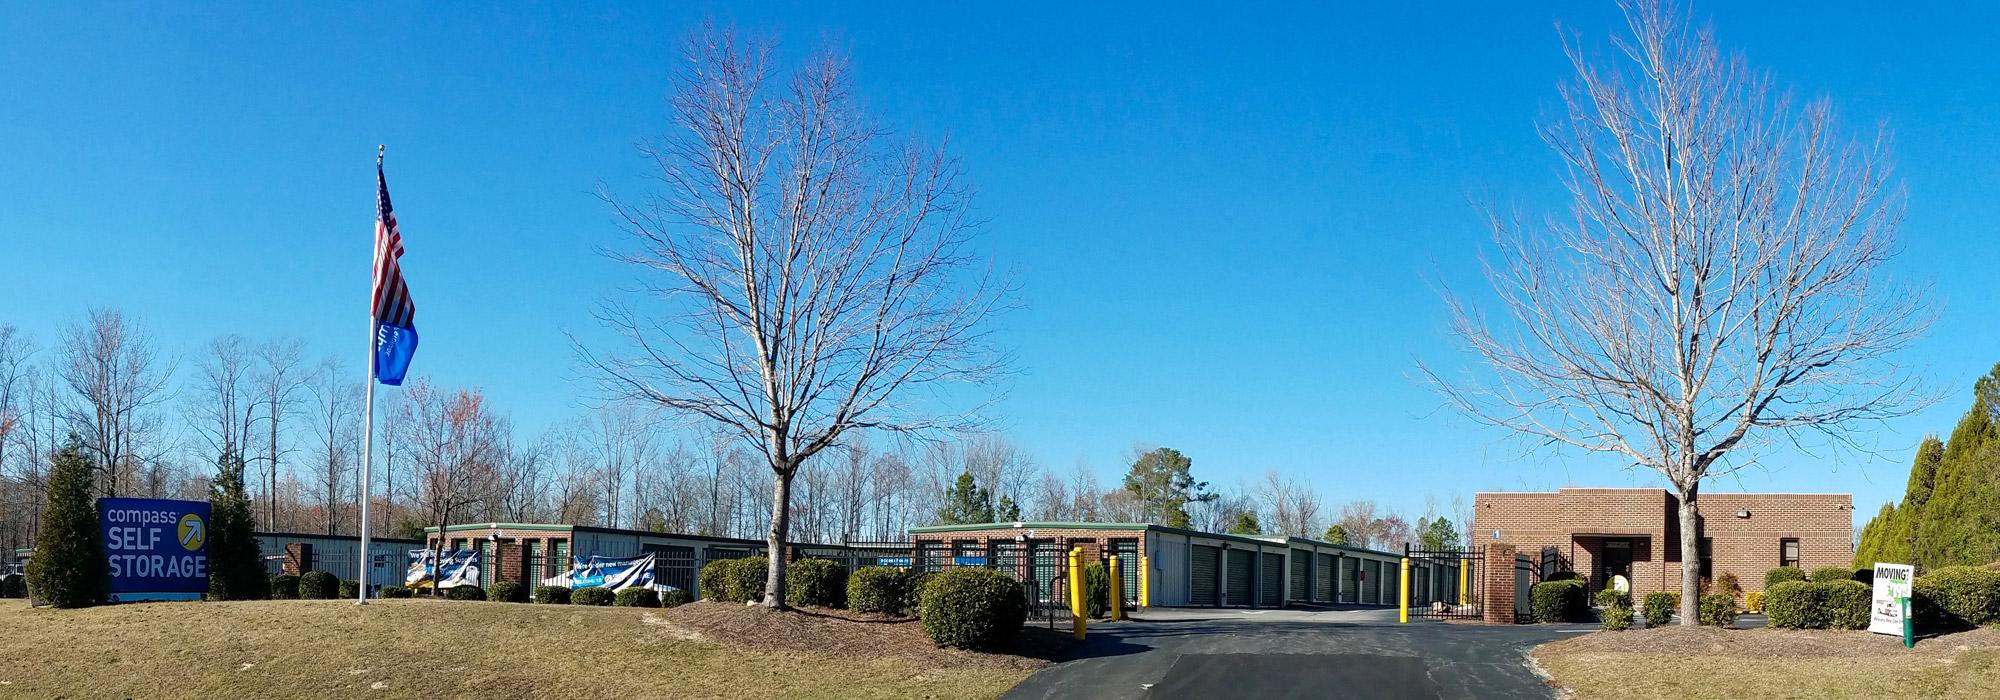 Self storage in Wendell NC